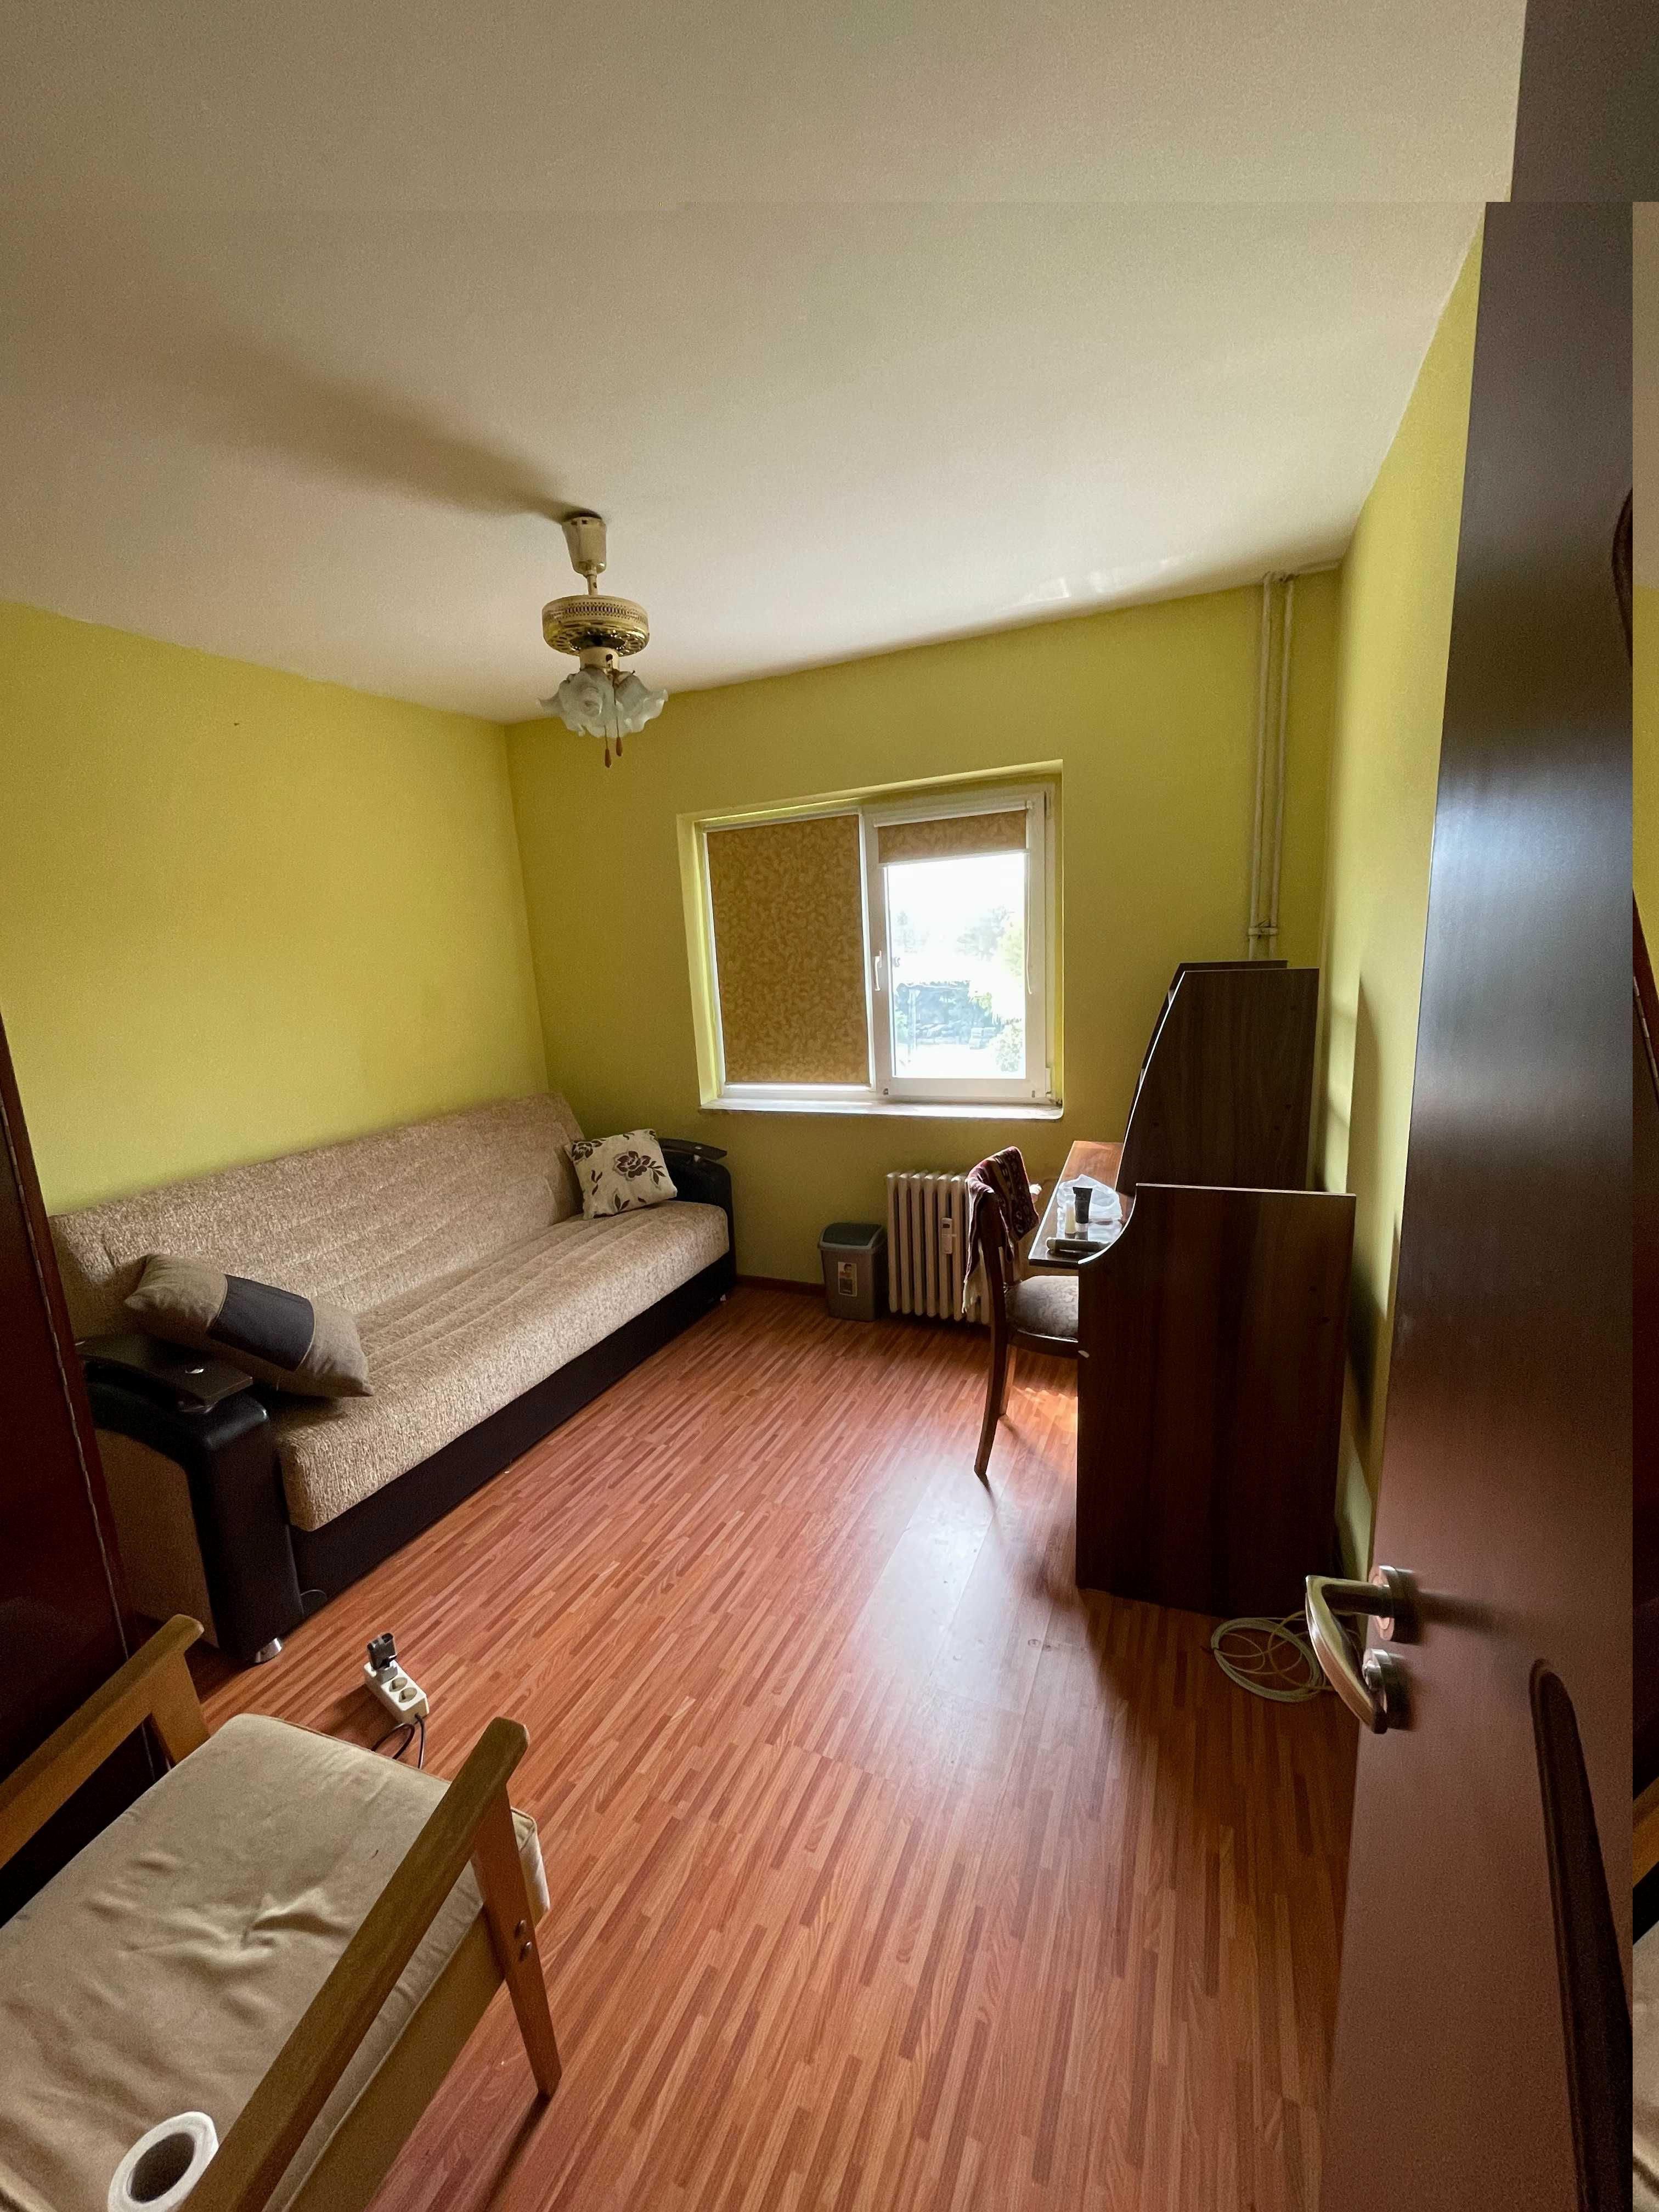 Apartament de închiriat 2 camere Brazda/Craiova